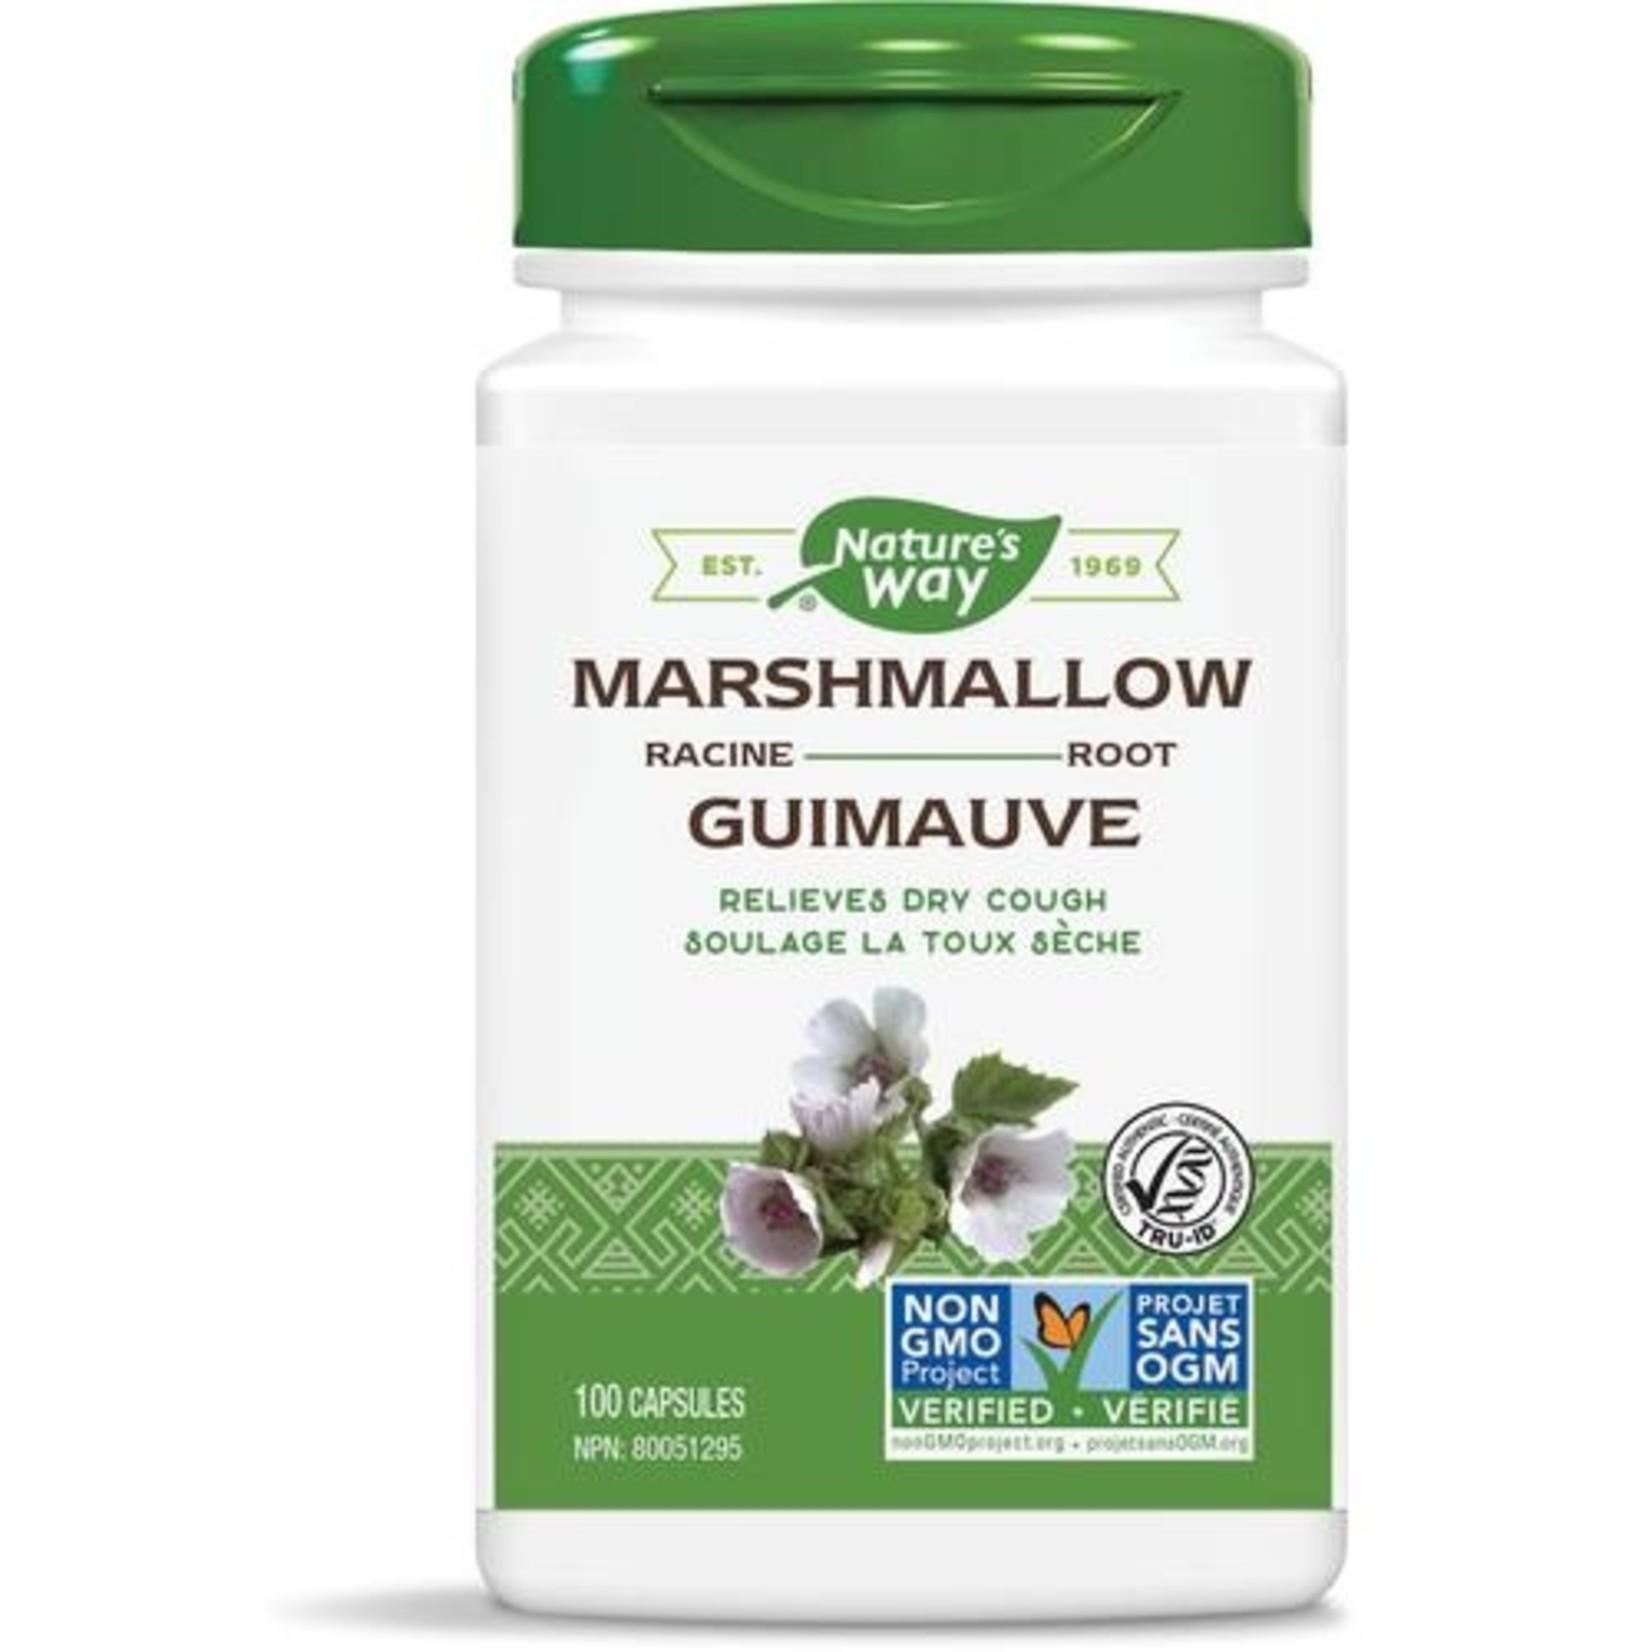 Nature's Way Marshmallow Root 100 caps